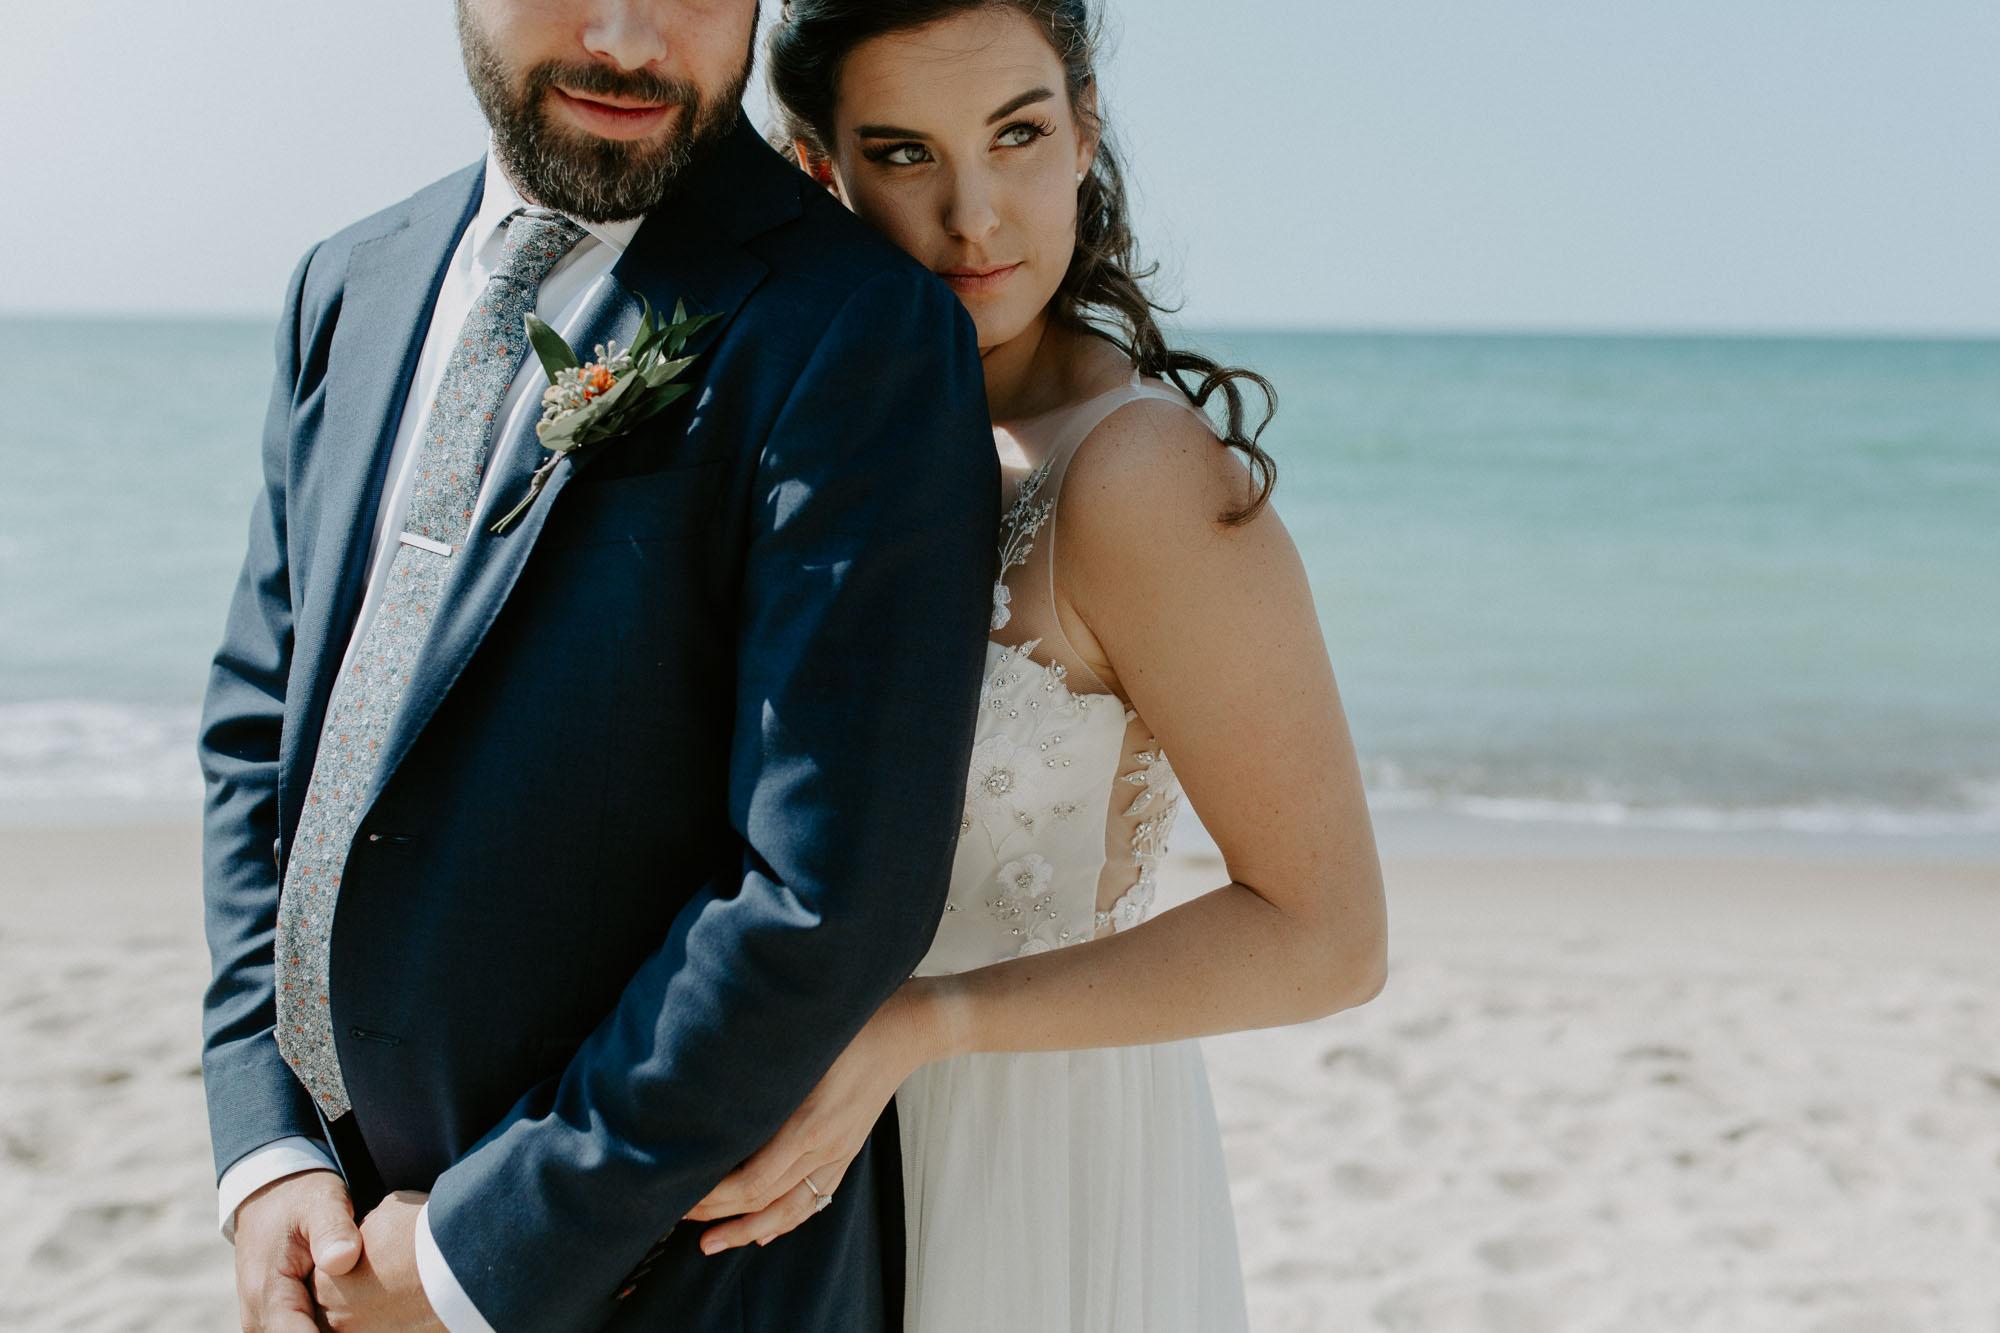 journeyman_distillery_wedding_photographer_chicago_il_wright_photographs-2823.jpg